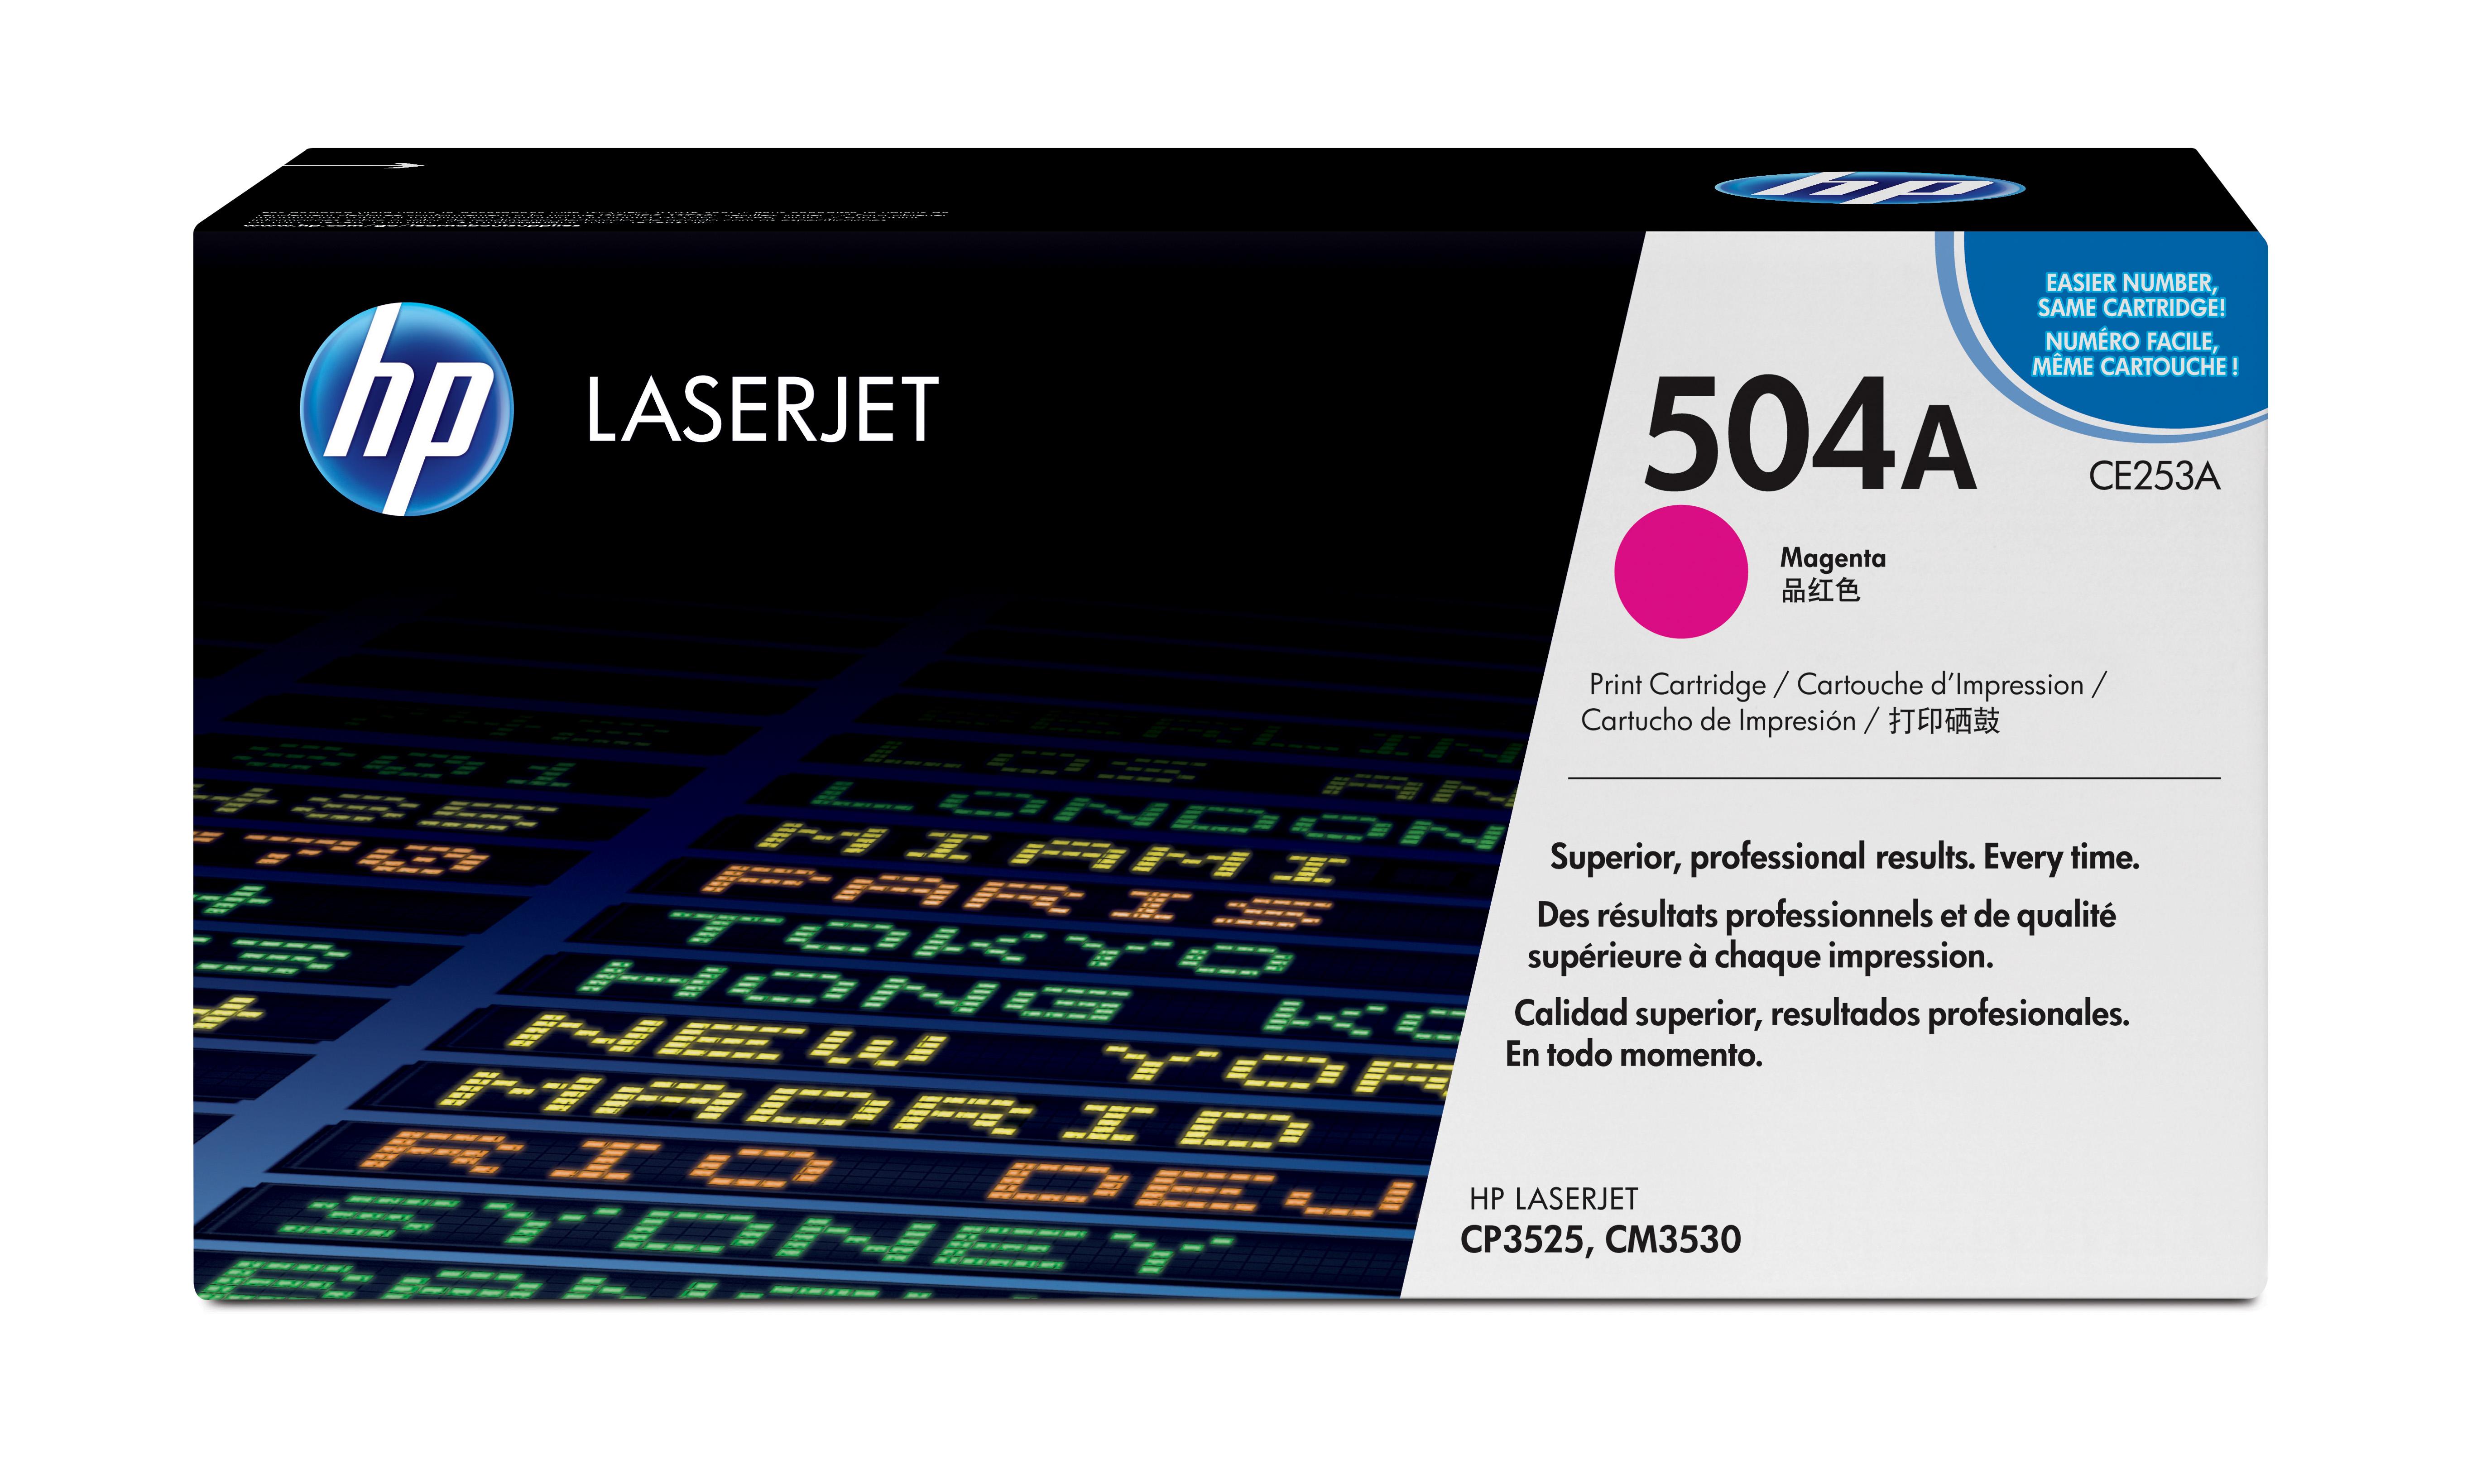 Toner láser HP 504A (CE253A) Magenta